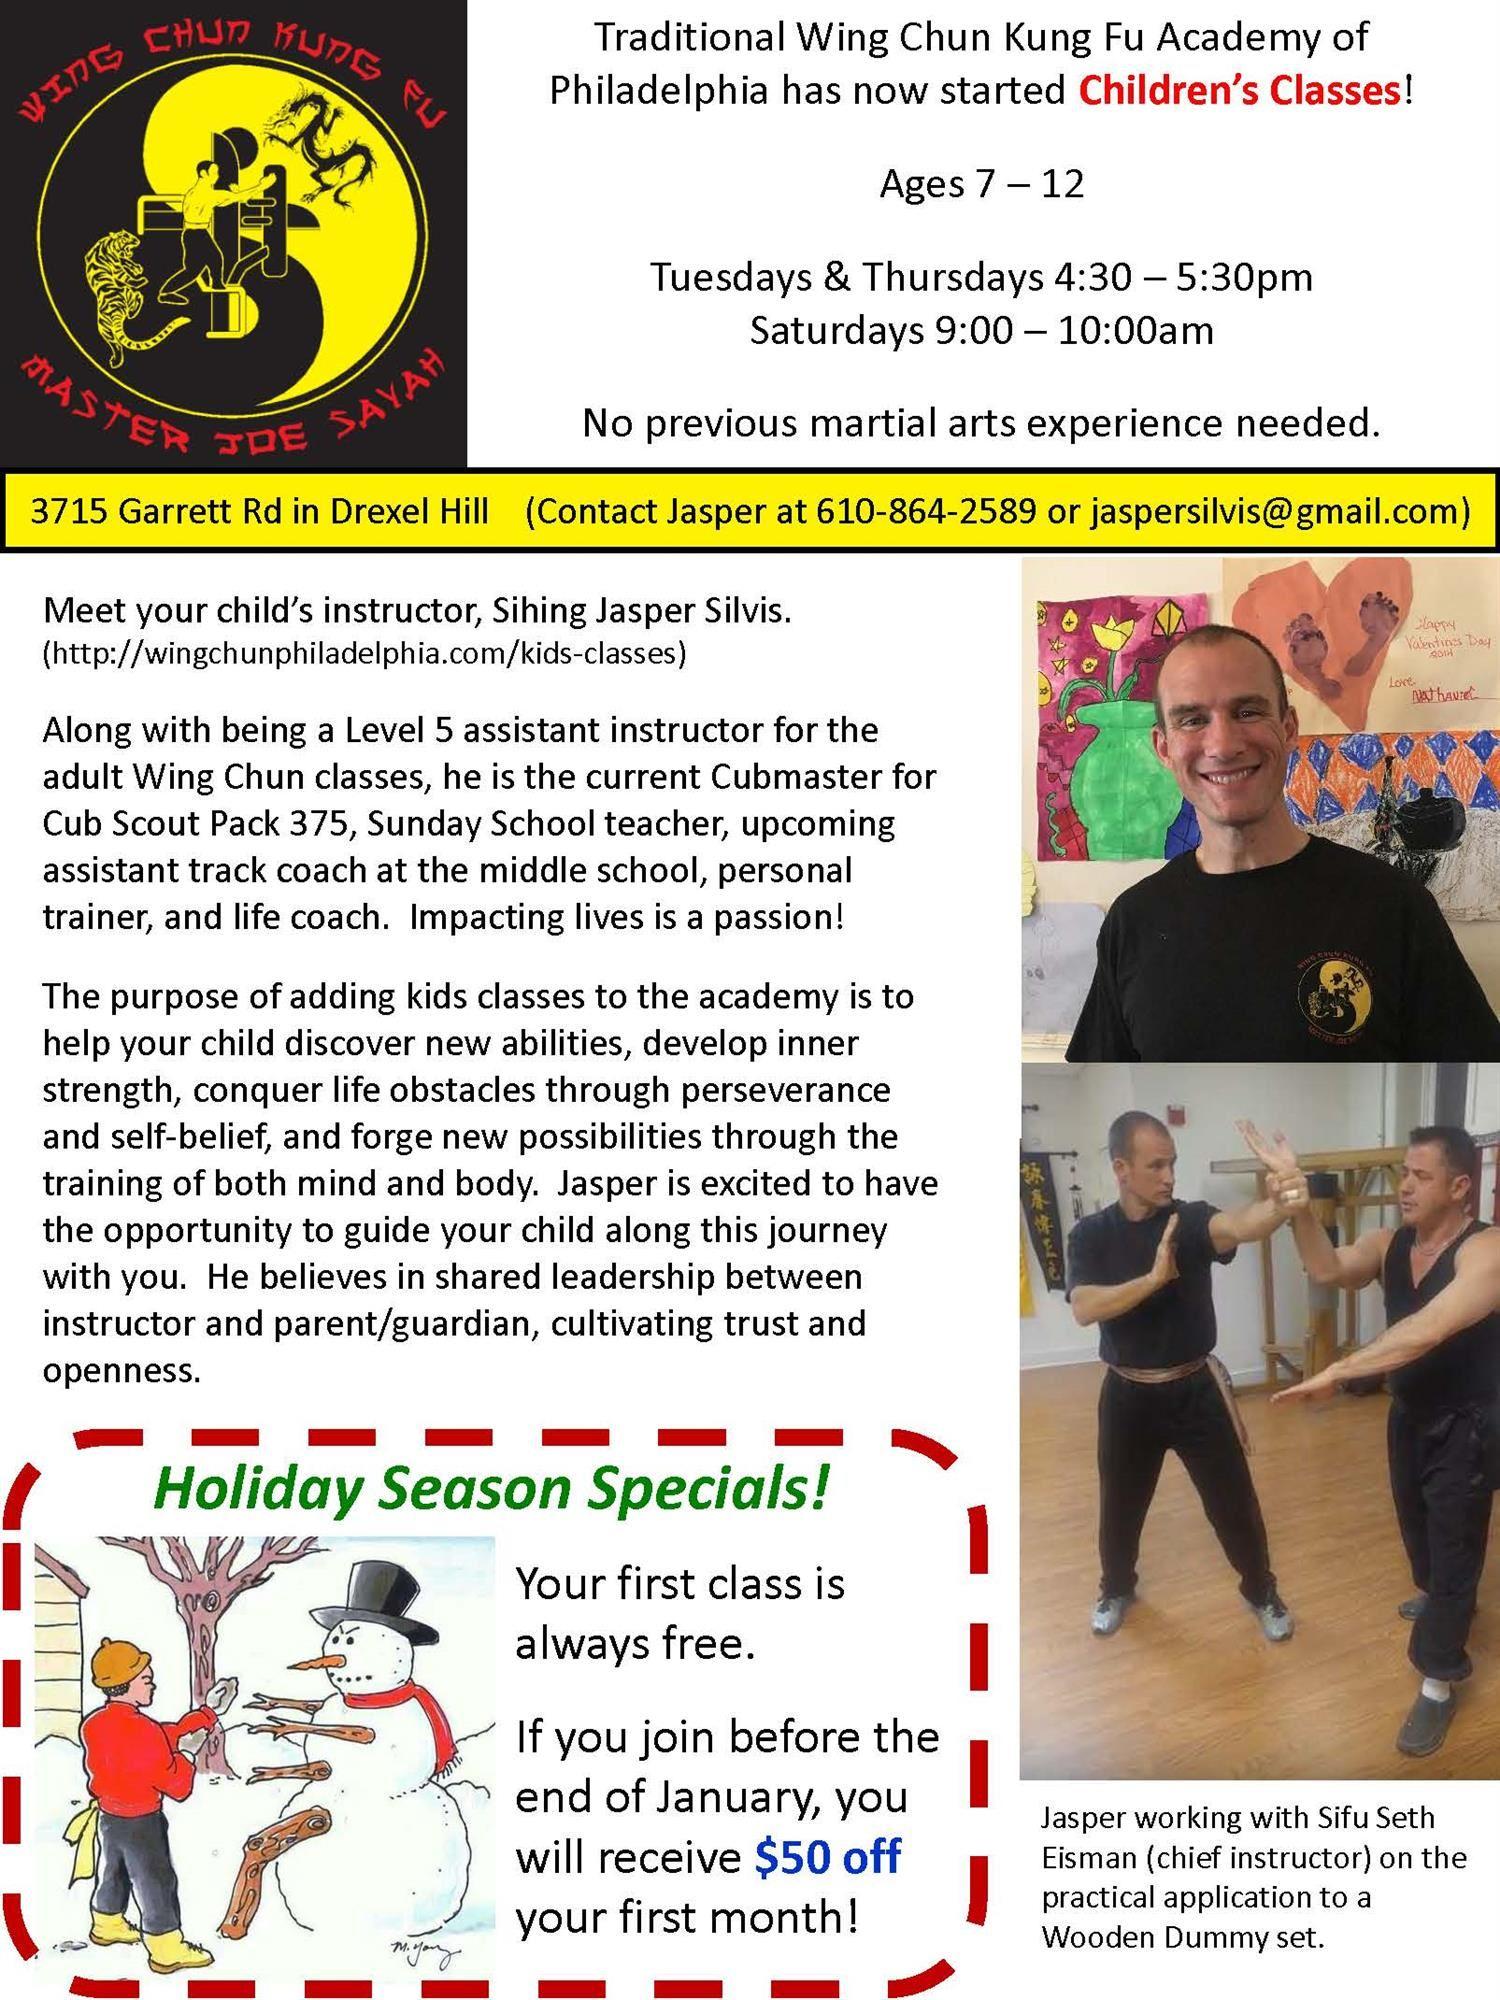 Traditional wing chun kung fu - Tyler elementary school